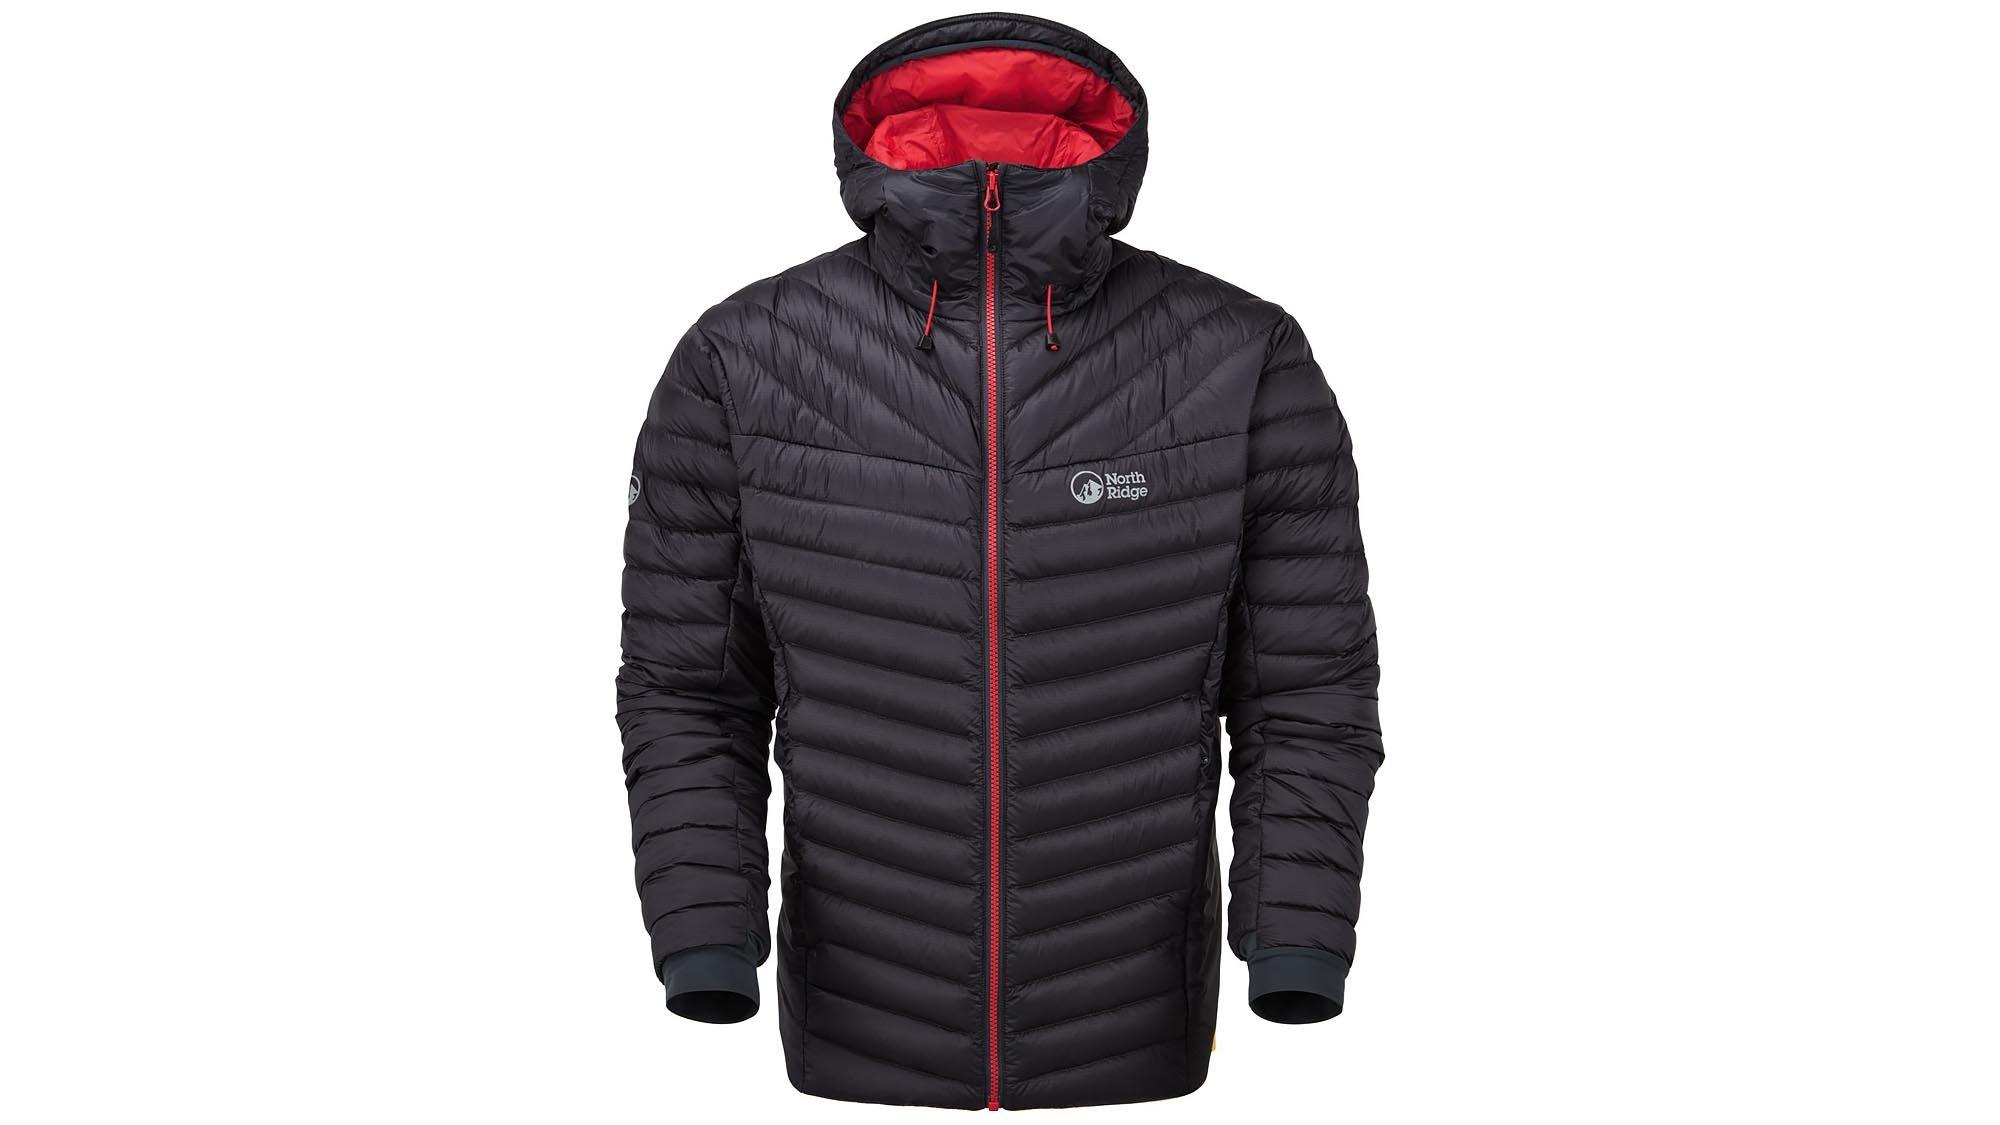 north ridge mens jacket